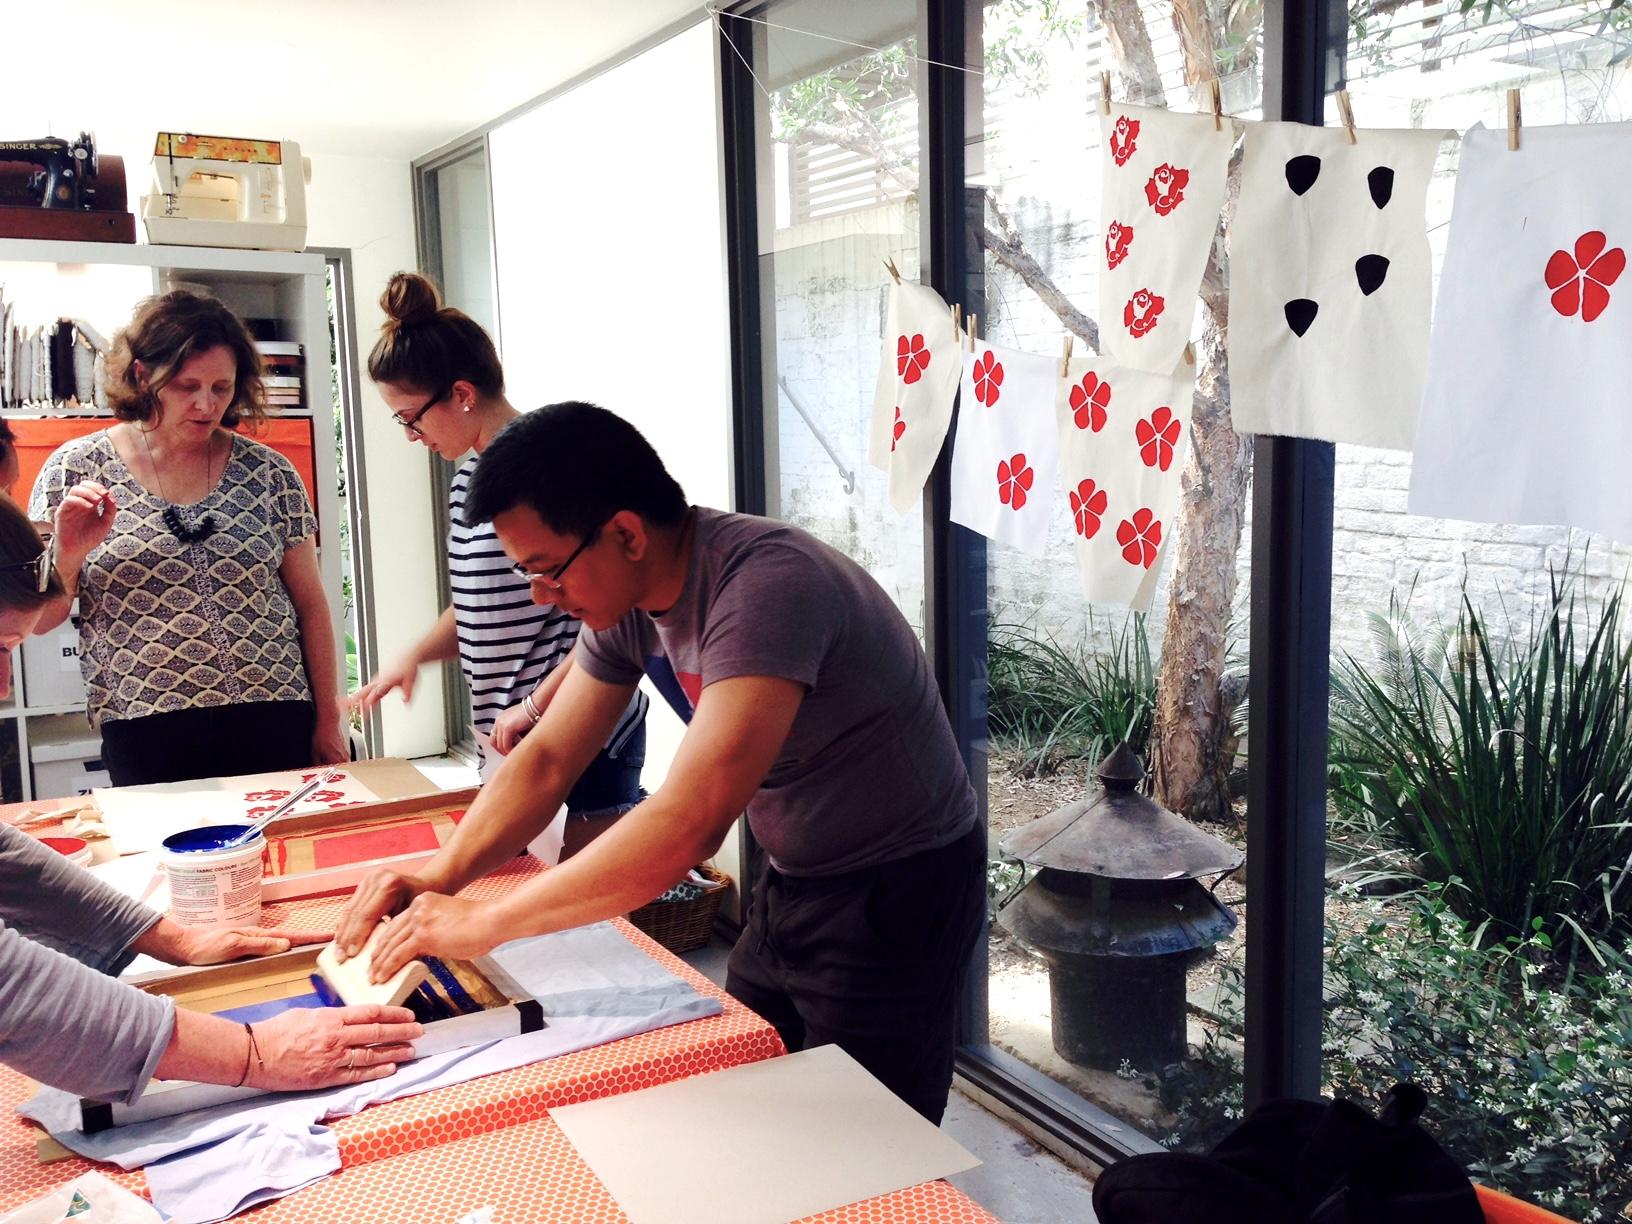 screen printing sydney coursesite - photo#20